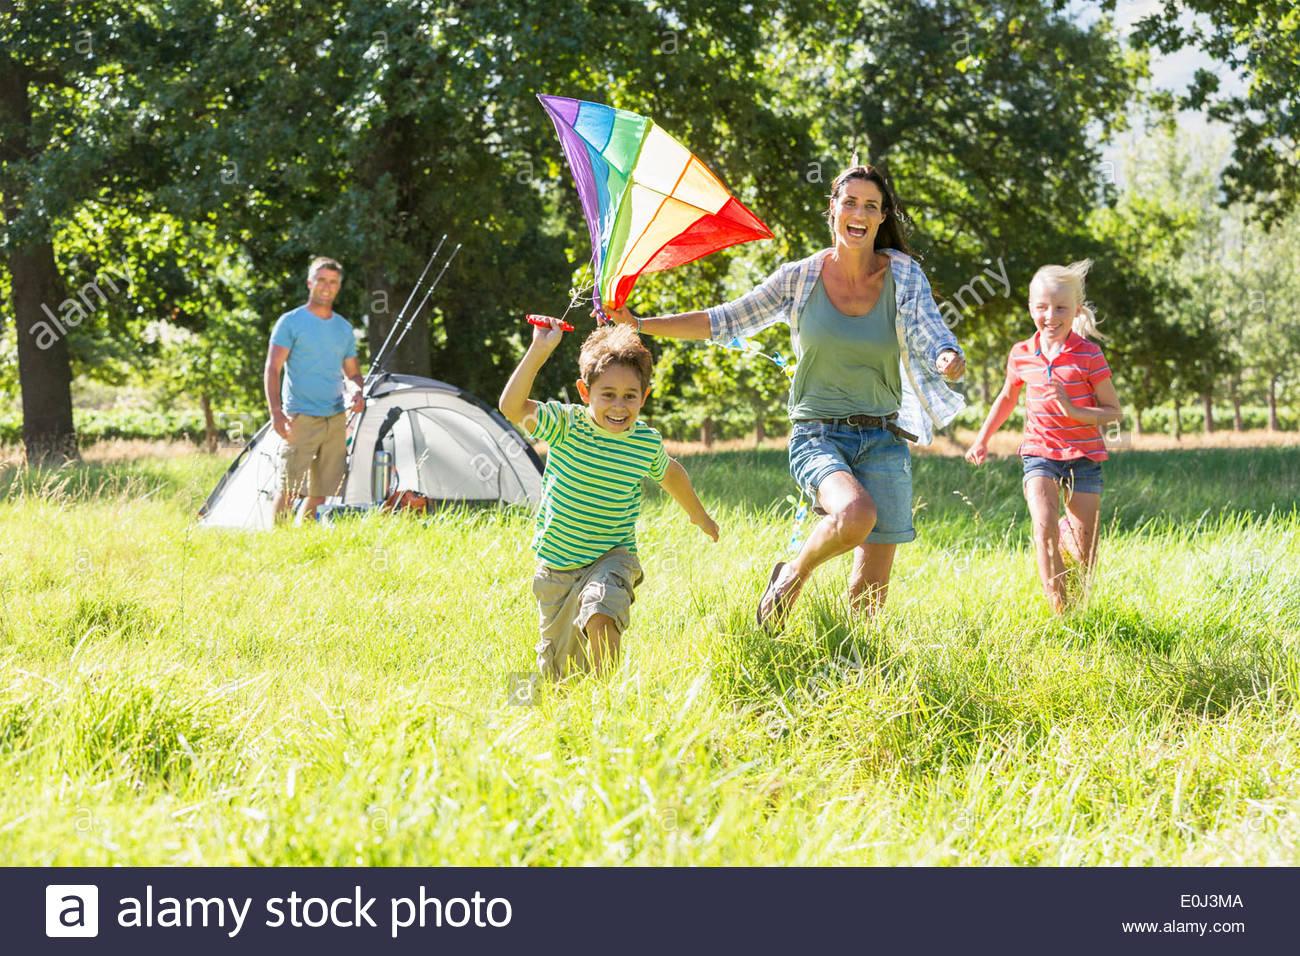 Familie fliegen Kite Camping Urlaub In Natur Stockbild